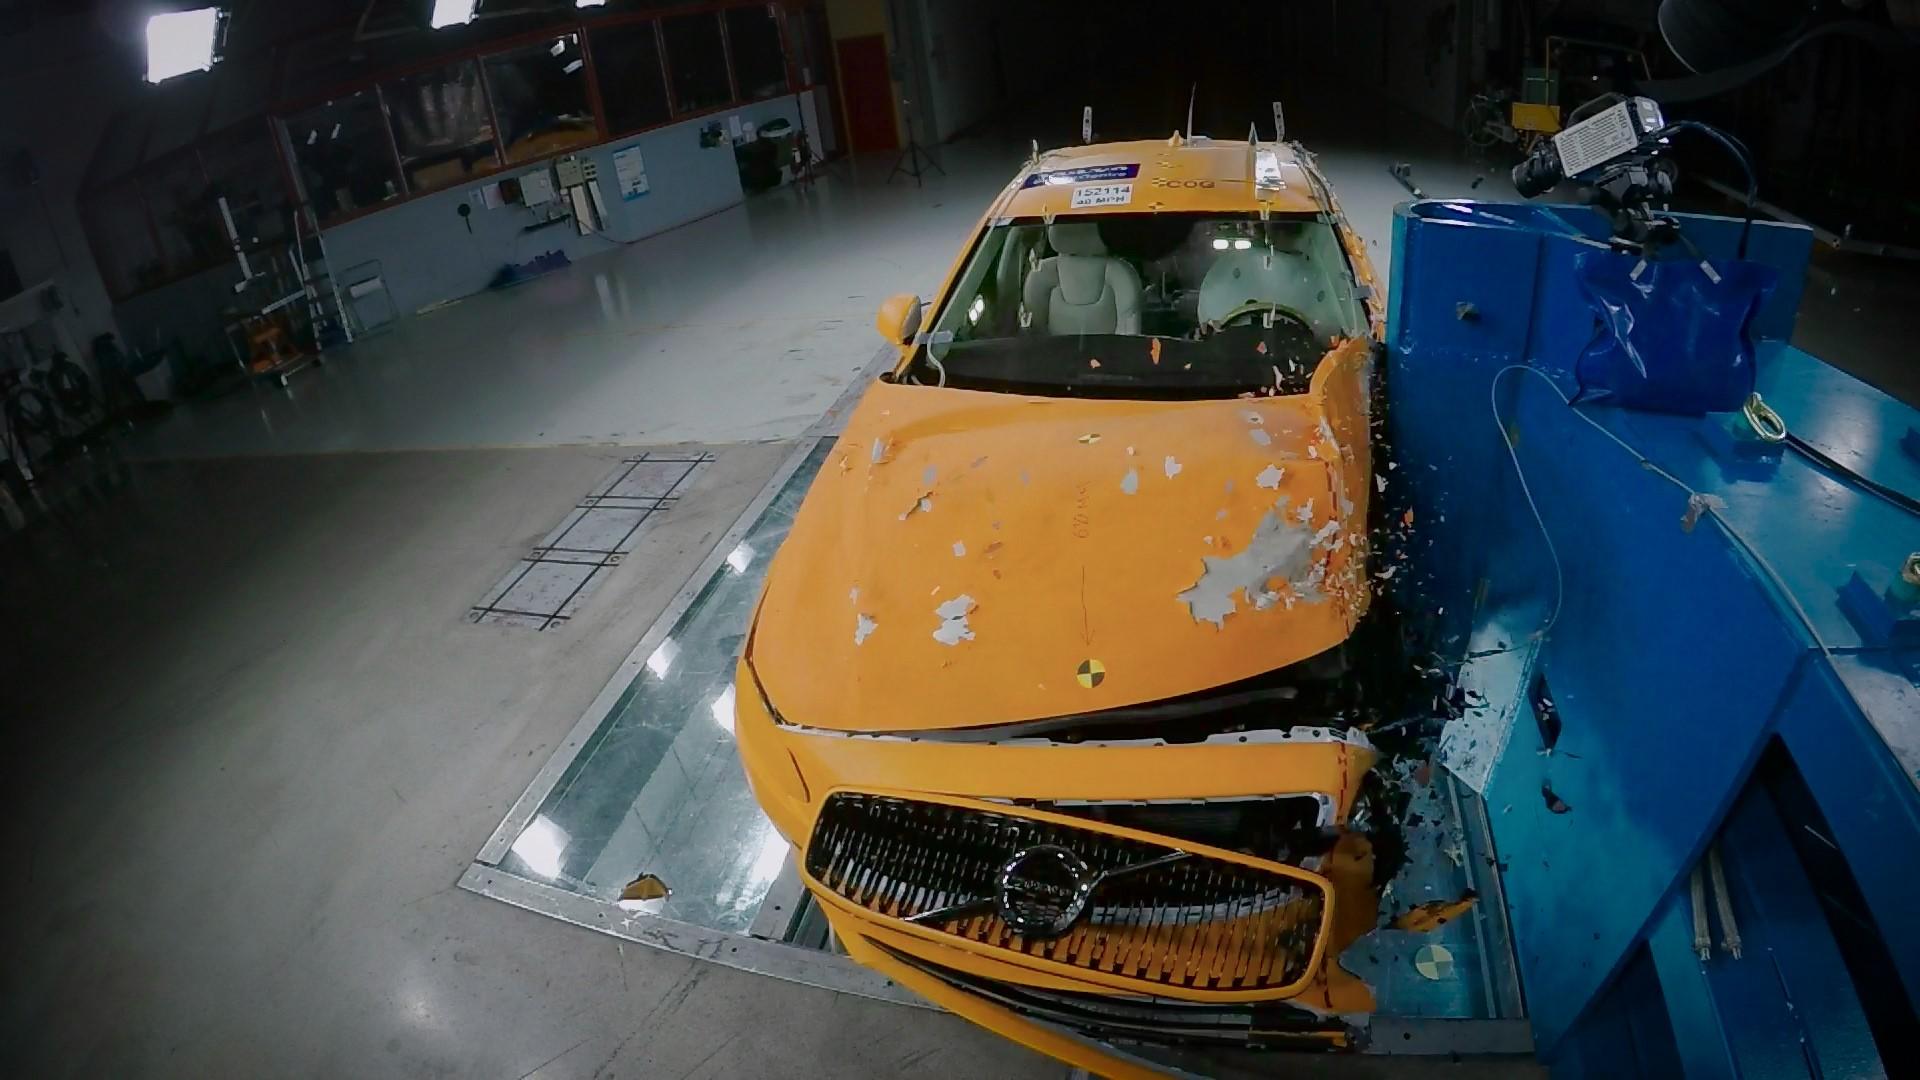 Volvo S90 Small Overlap Crash Test